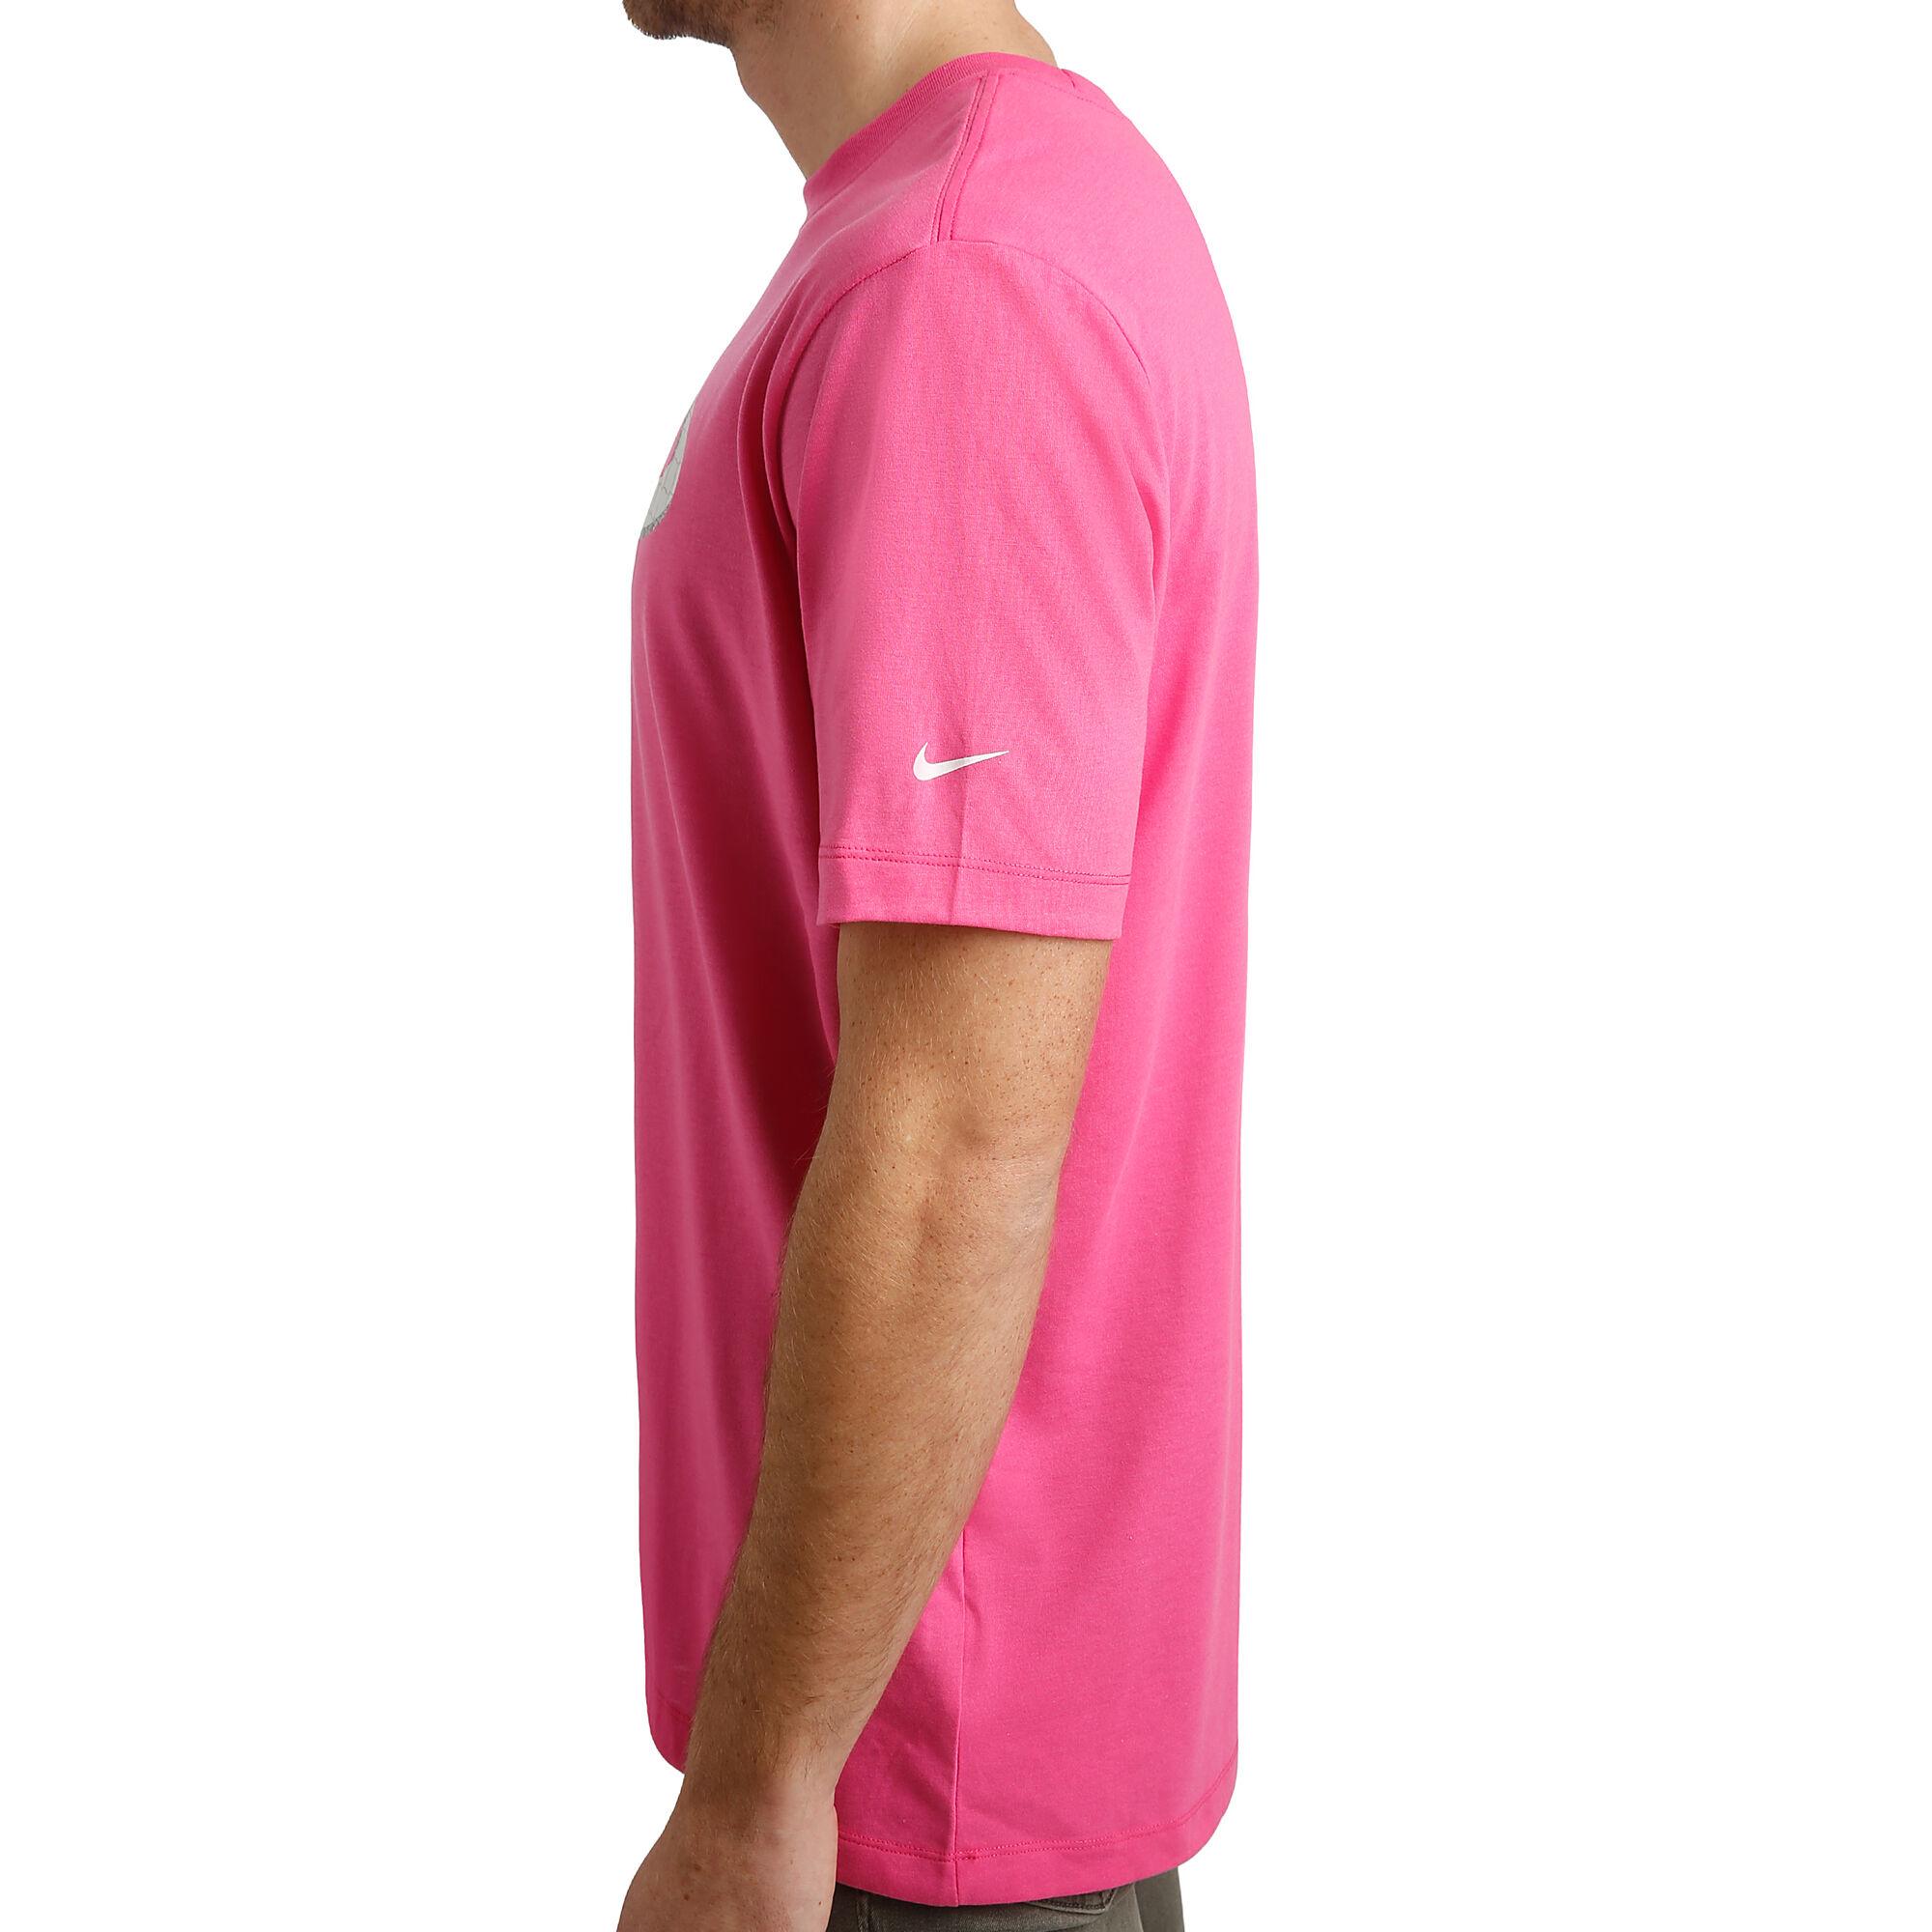 773bfe1484f6 Nike Rafael Nadal Court Dri-Fit Tričko Muži - Růžová